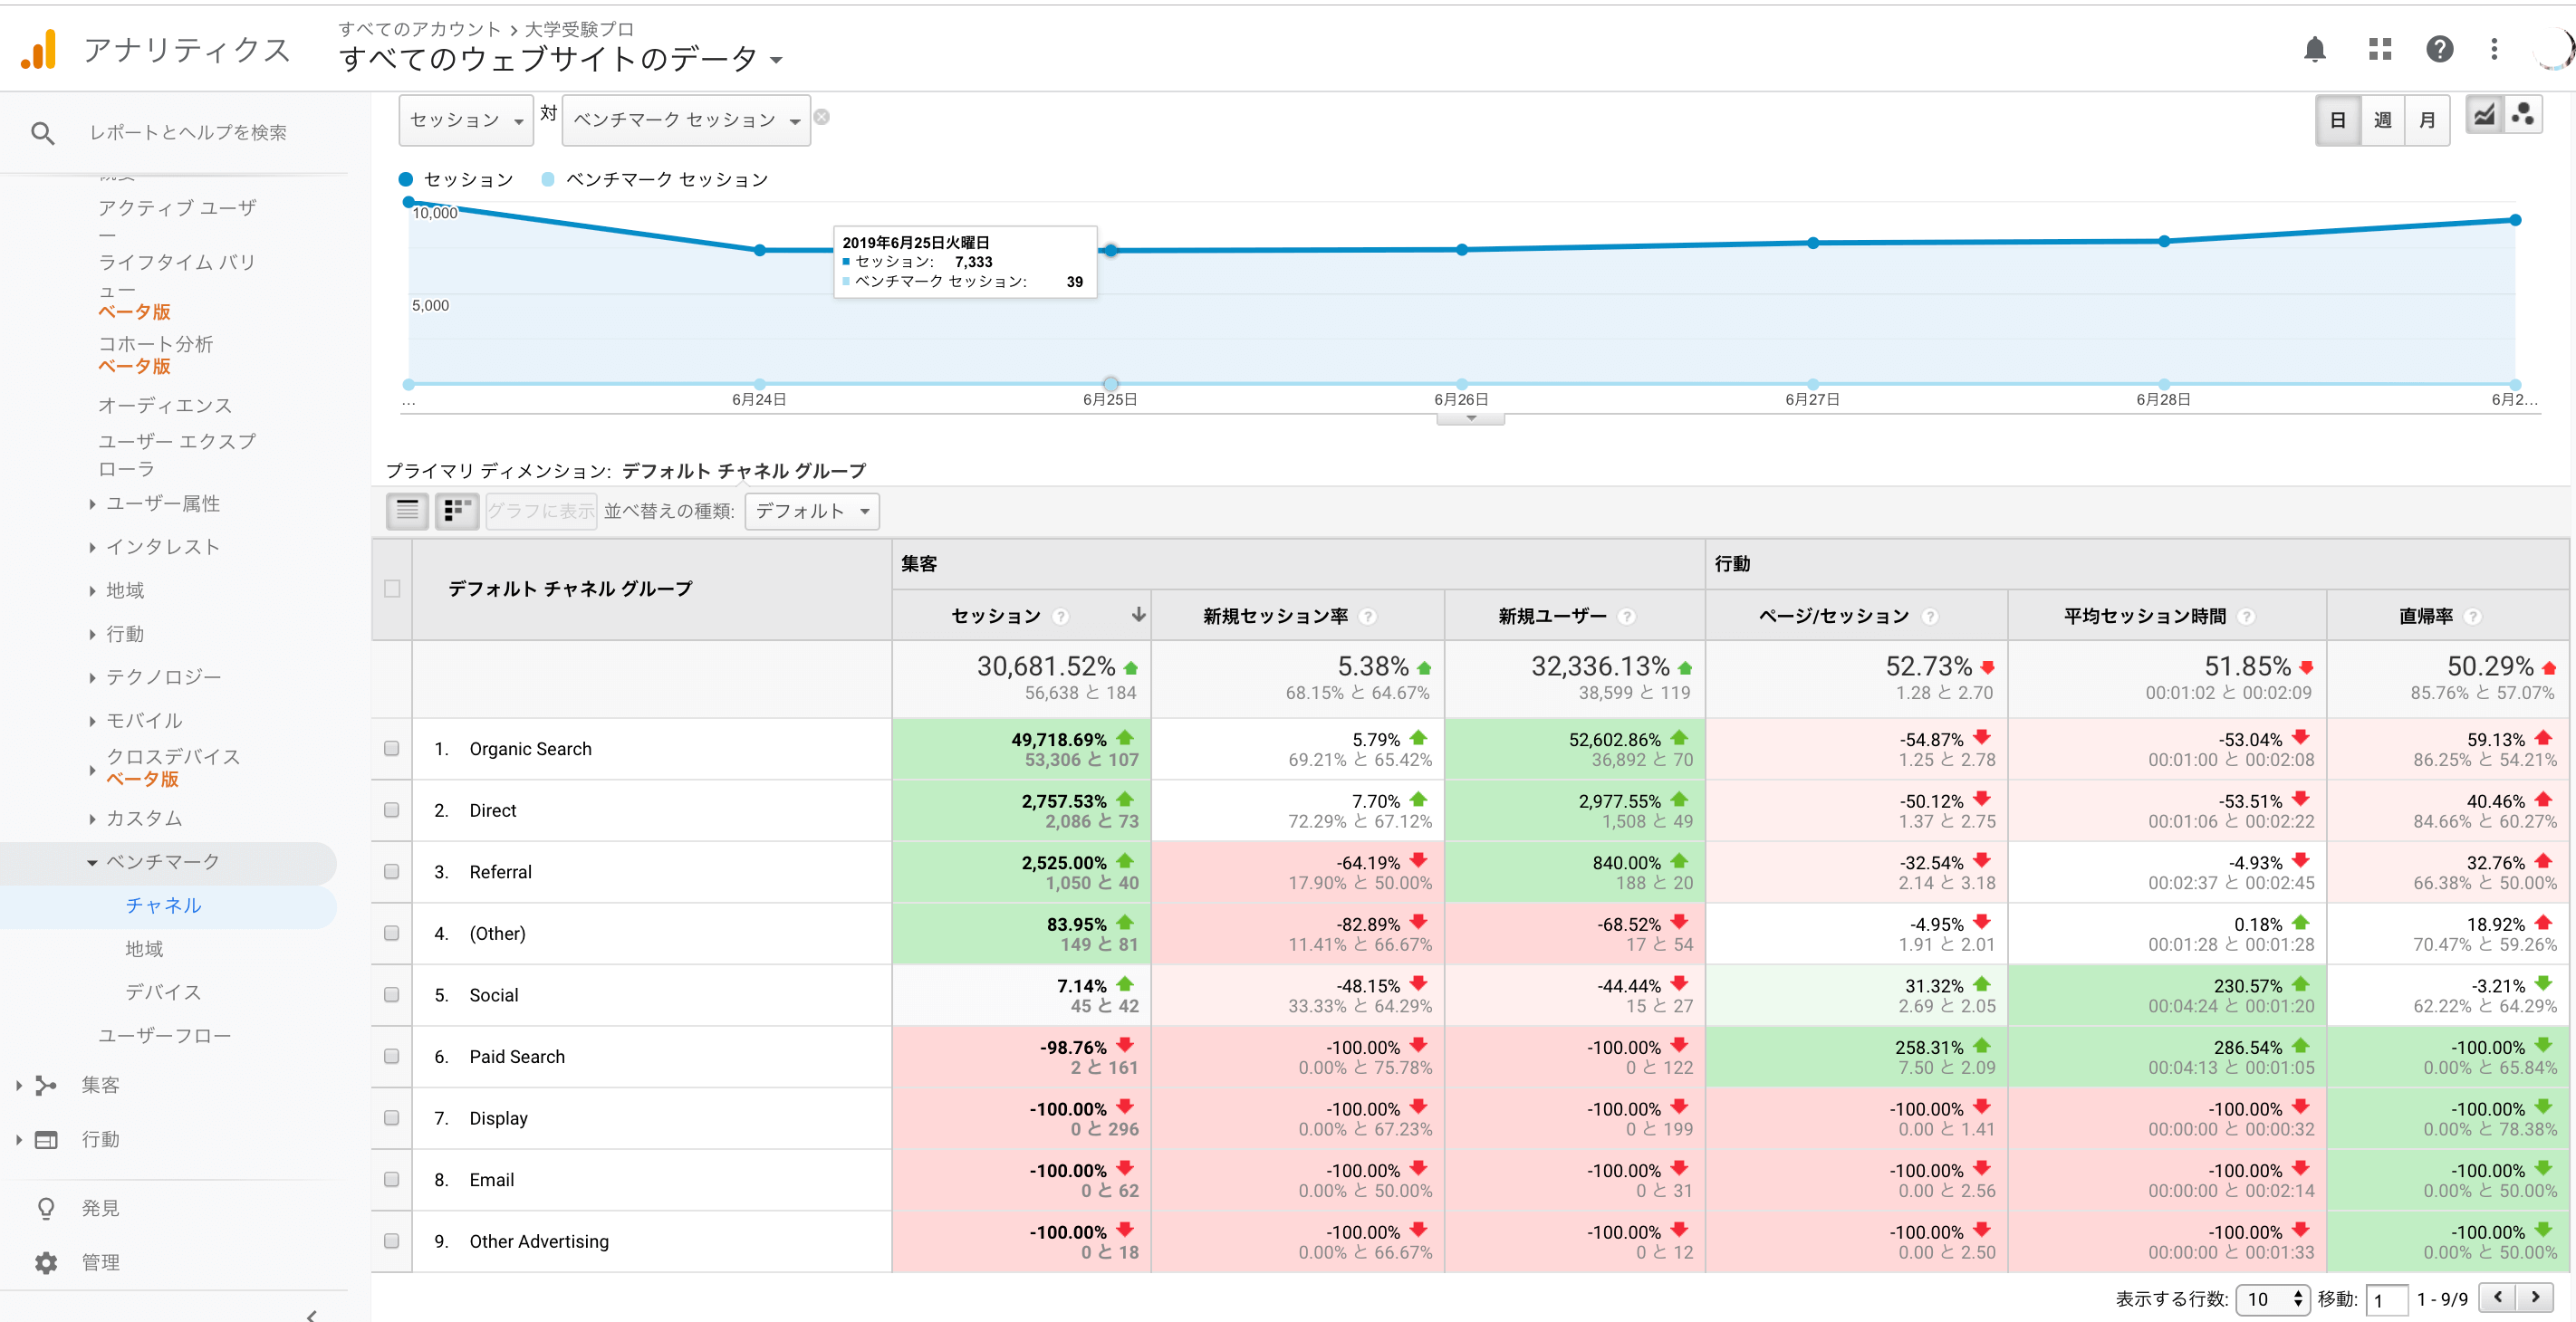 google analyticsのユーザーレポートのベンチマークのチャネル